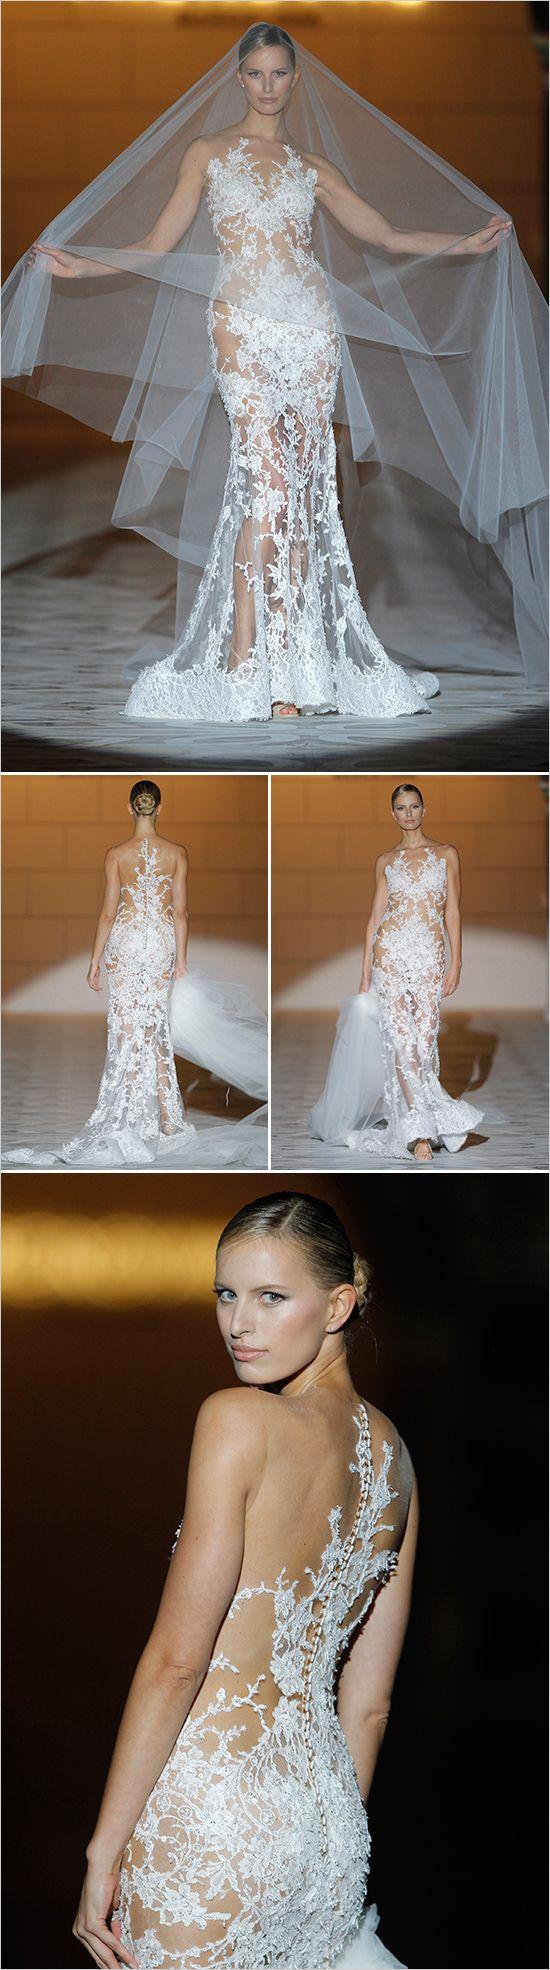 Karolina Kurkova In Pronovias lace sheath dress. ---> http://www.weddingchicks.com/2014/05/14/2015-pronovias-bridal-show/